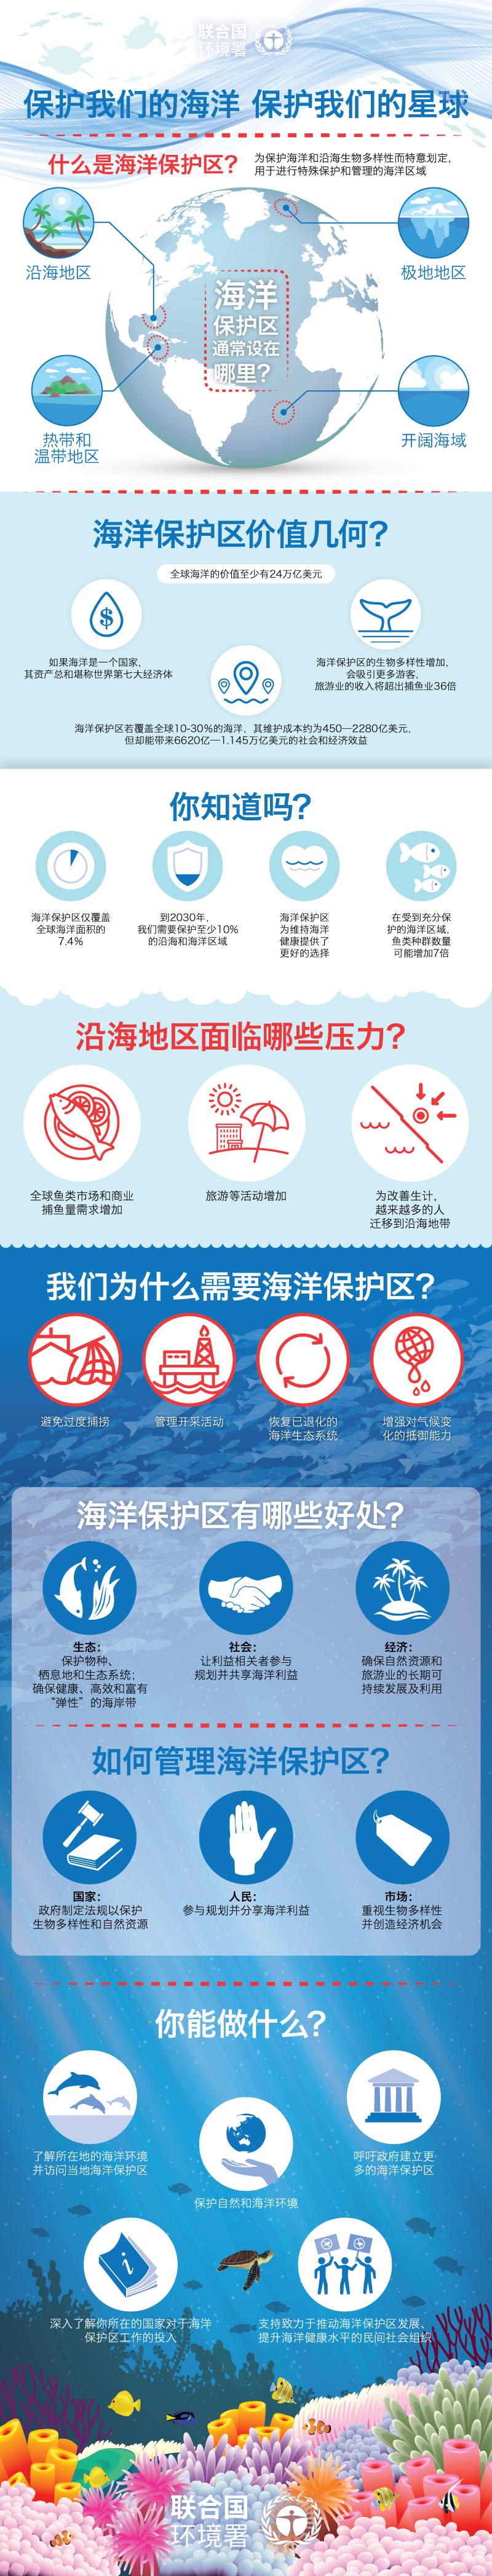 CH_MPAs_infographic.jpg